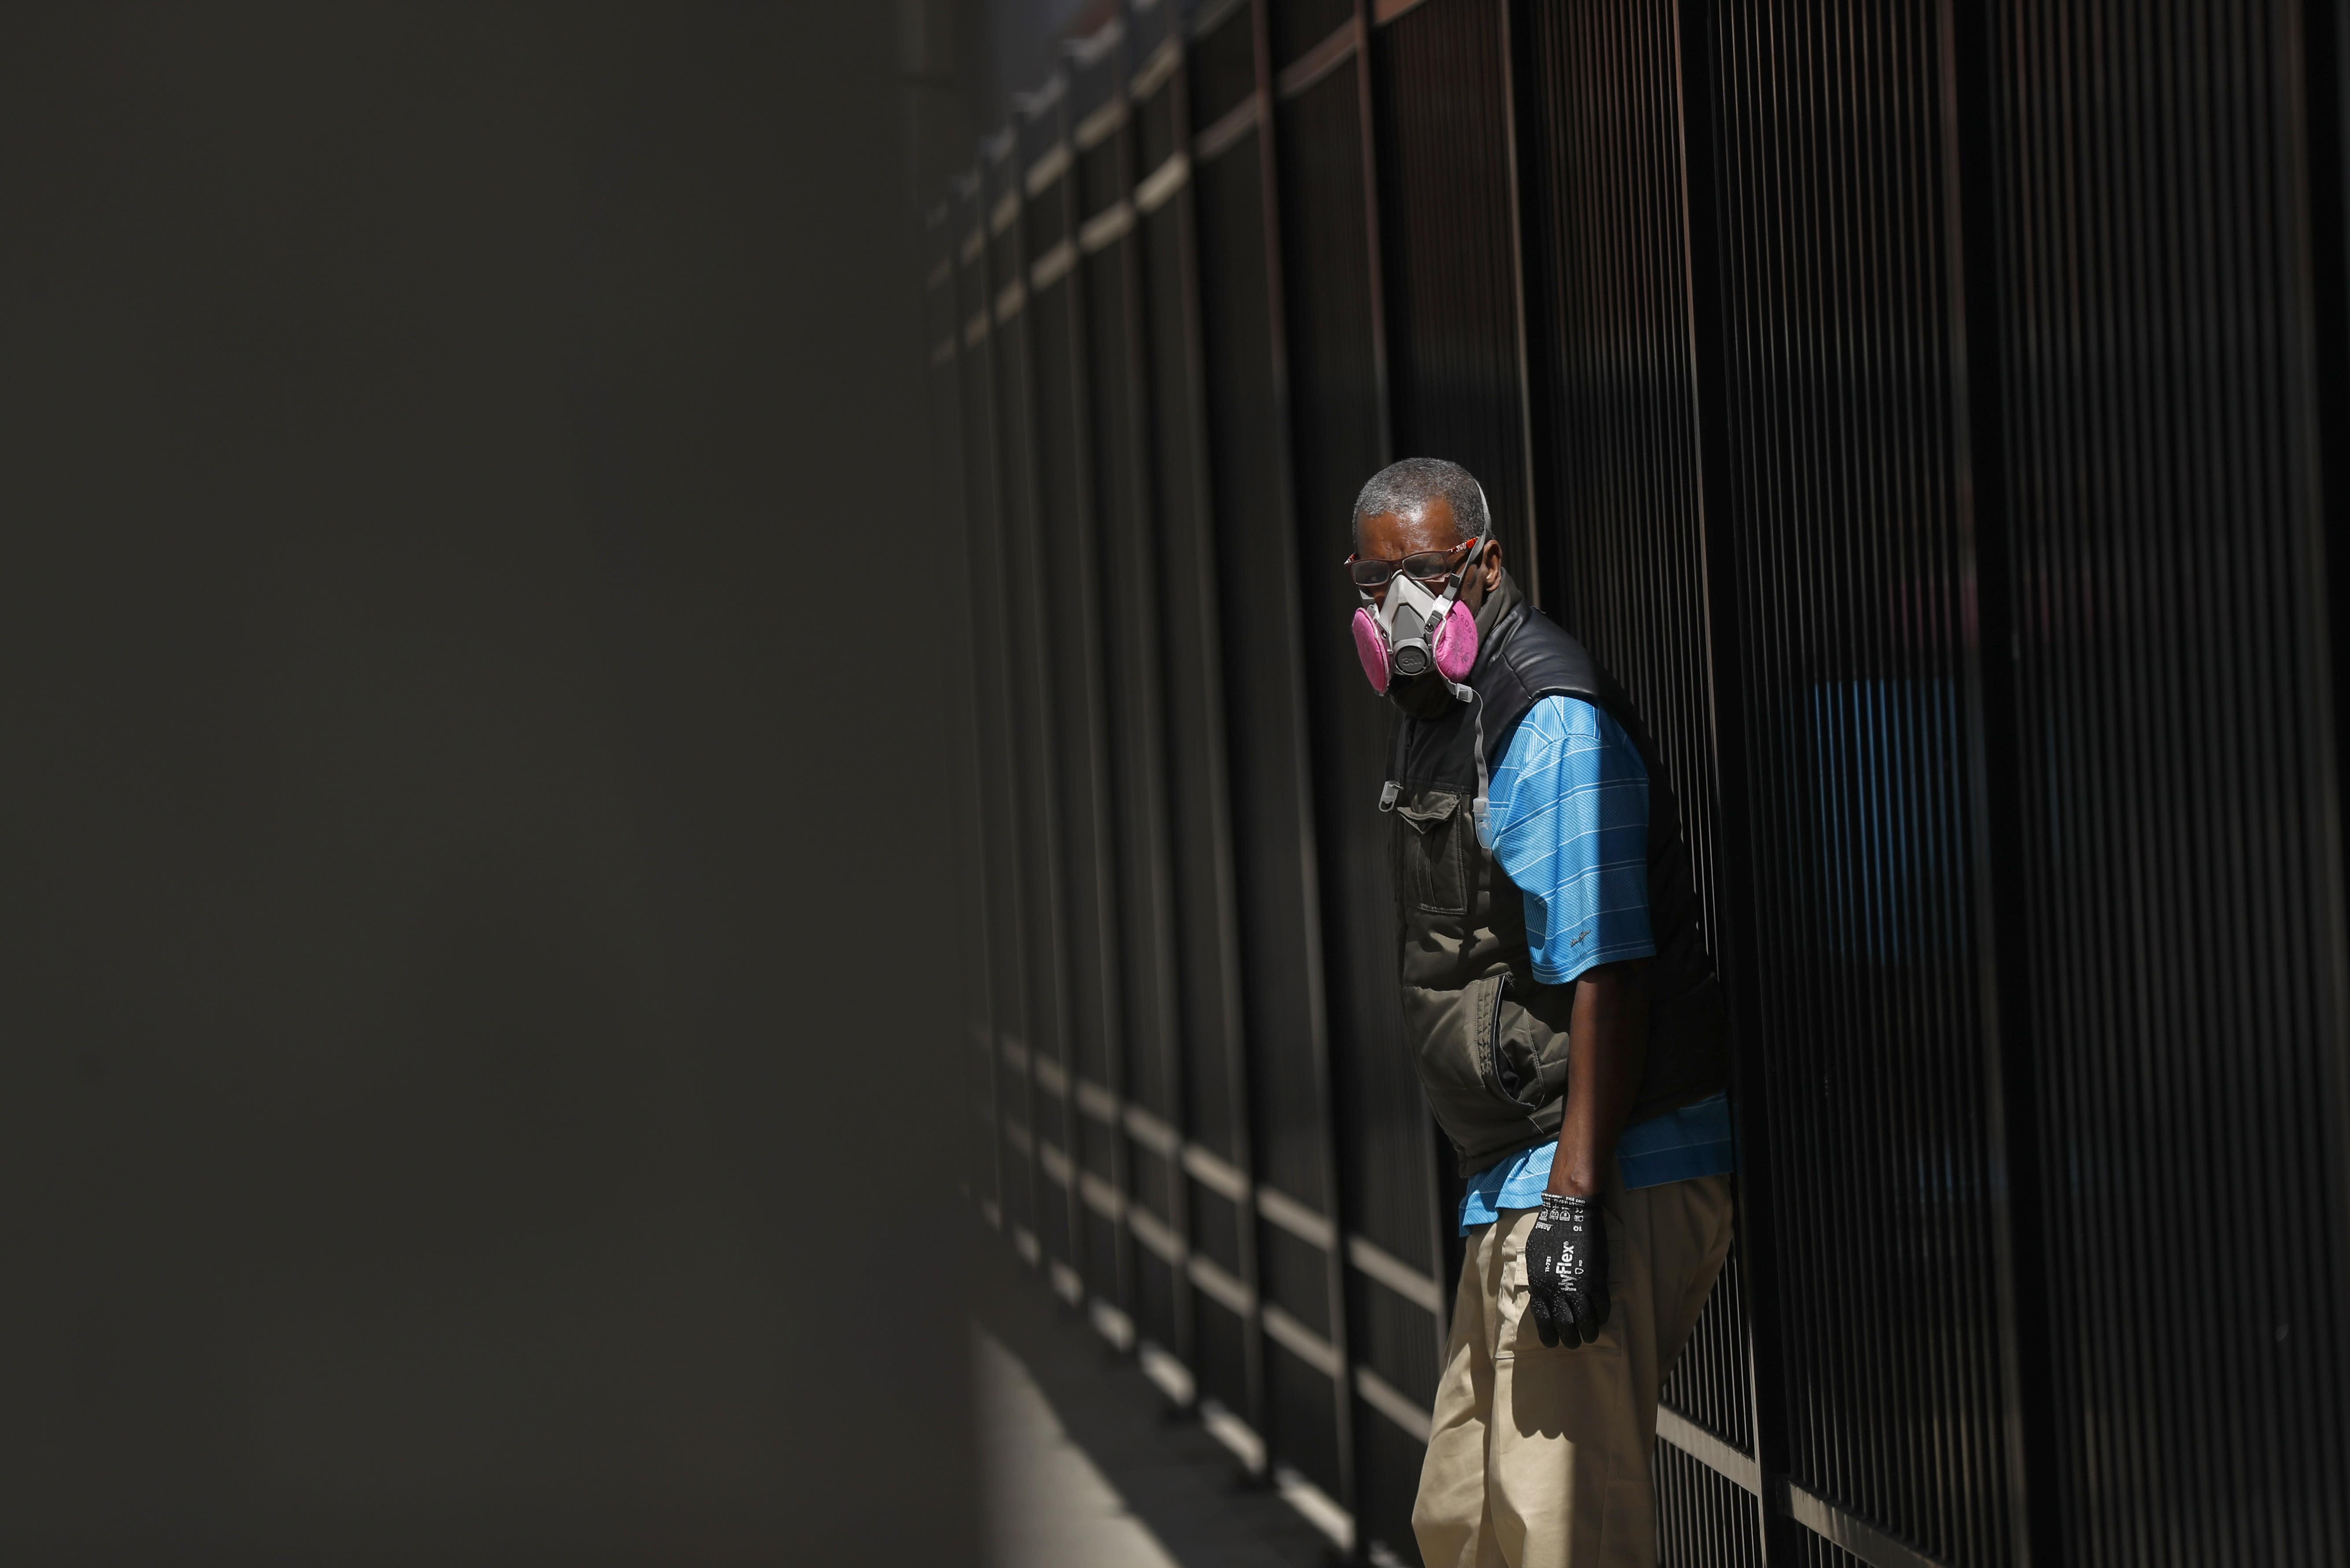 Coronavirus: US health official warns of risky second wave